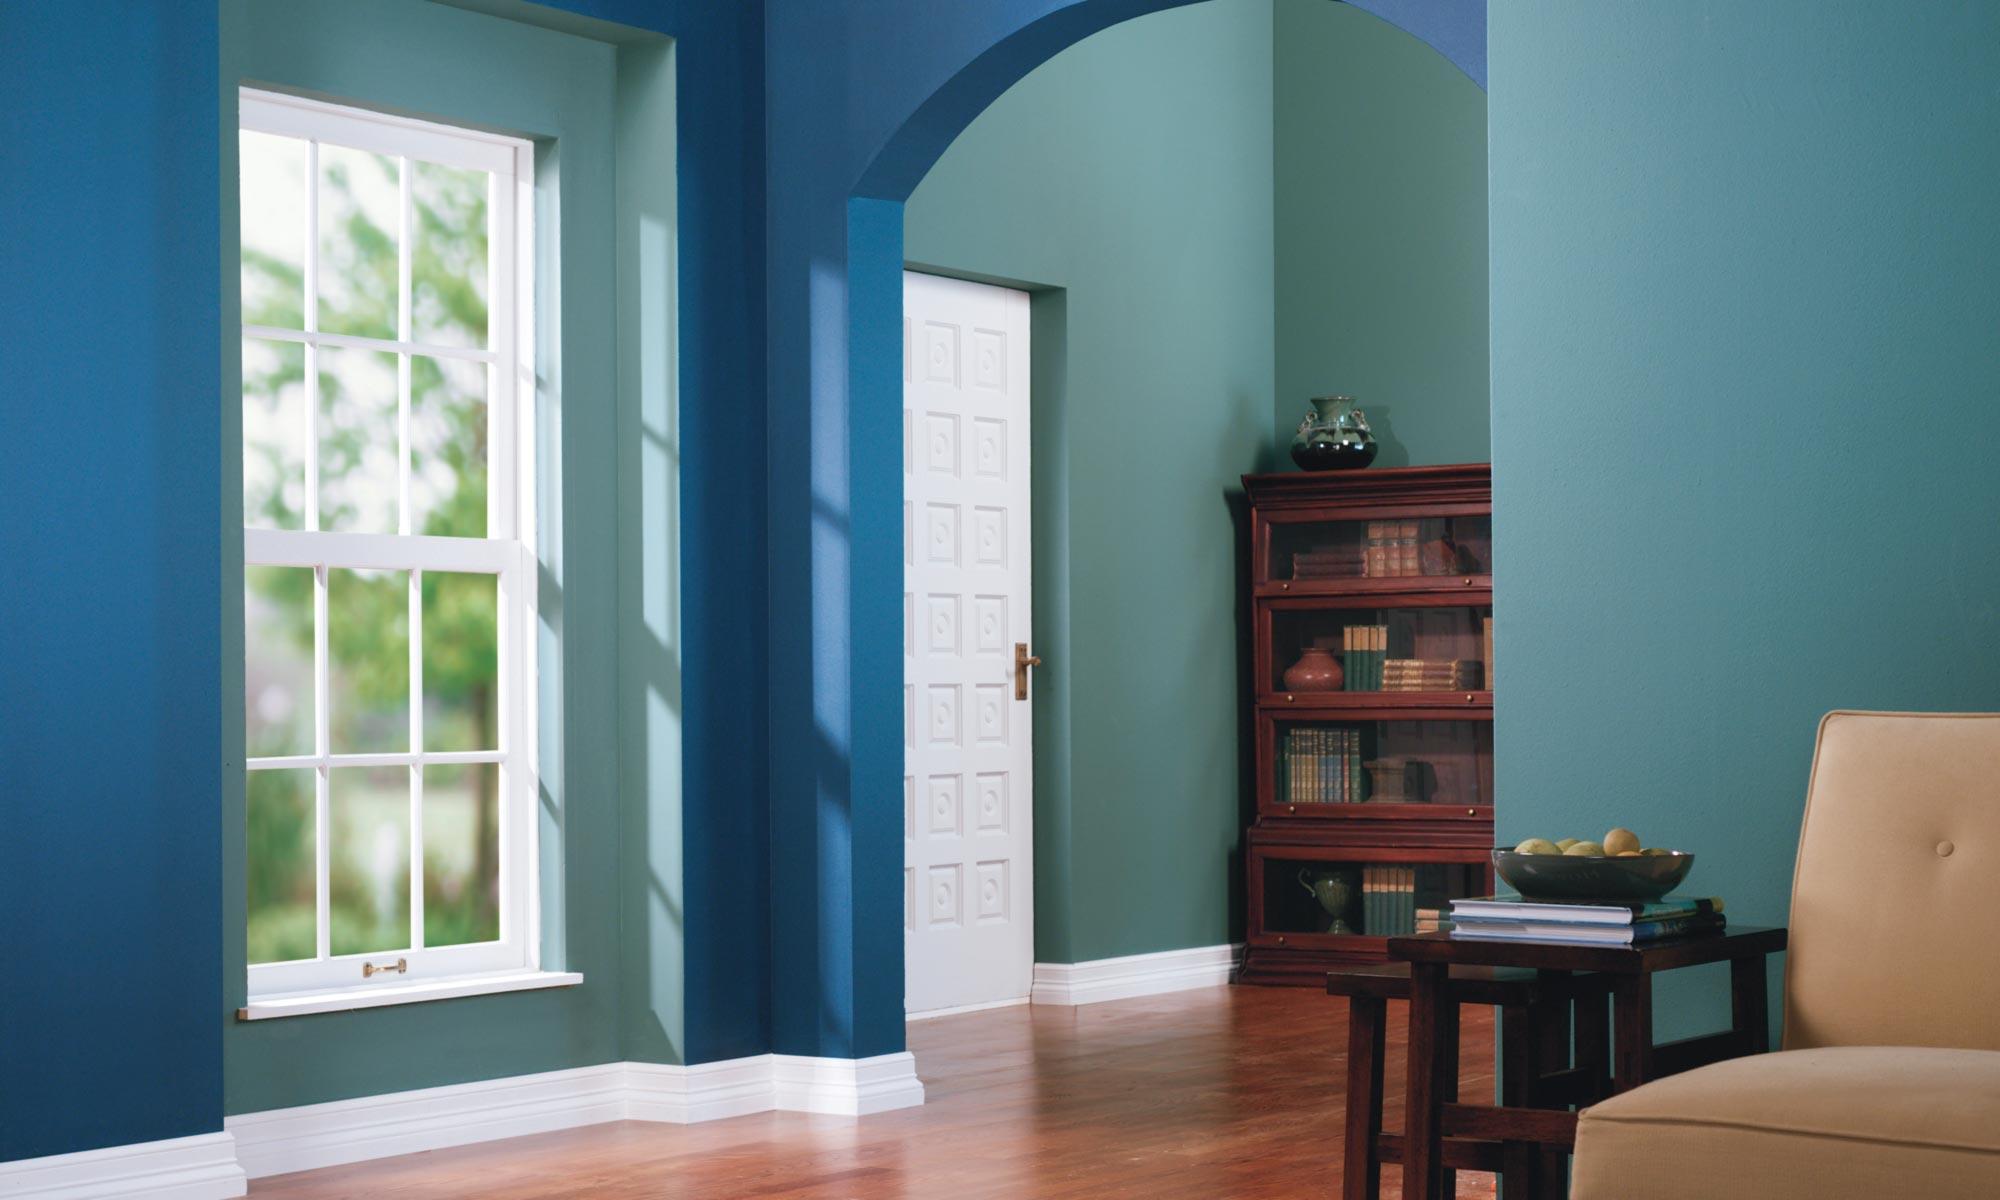 Best Home Color Design Pictures Images - Interior Design Ideas ...